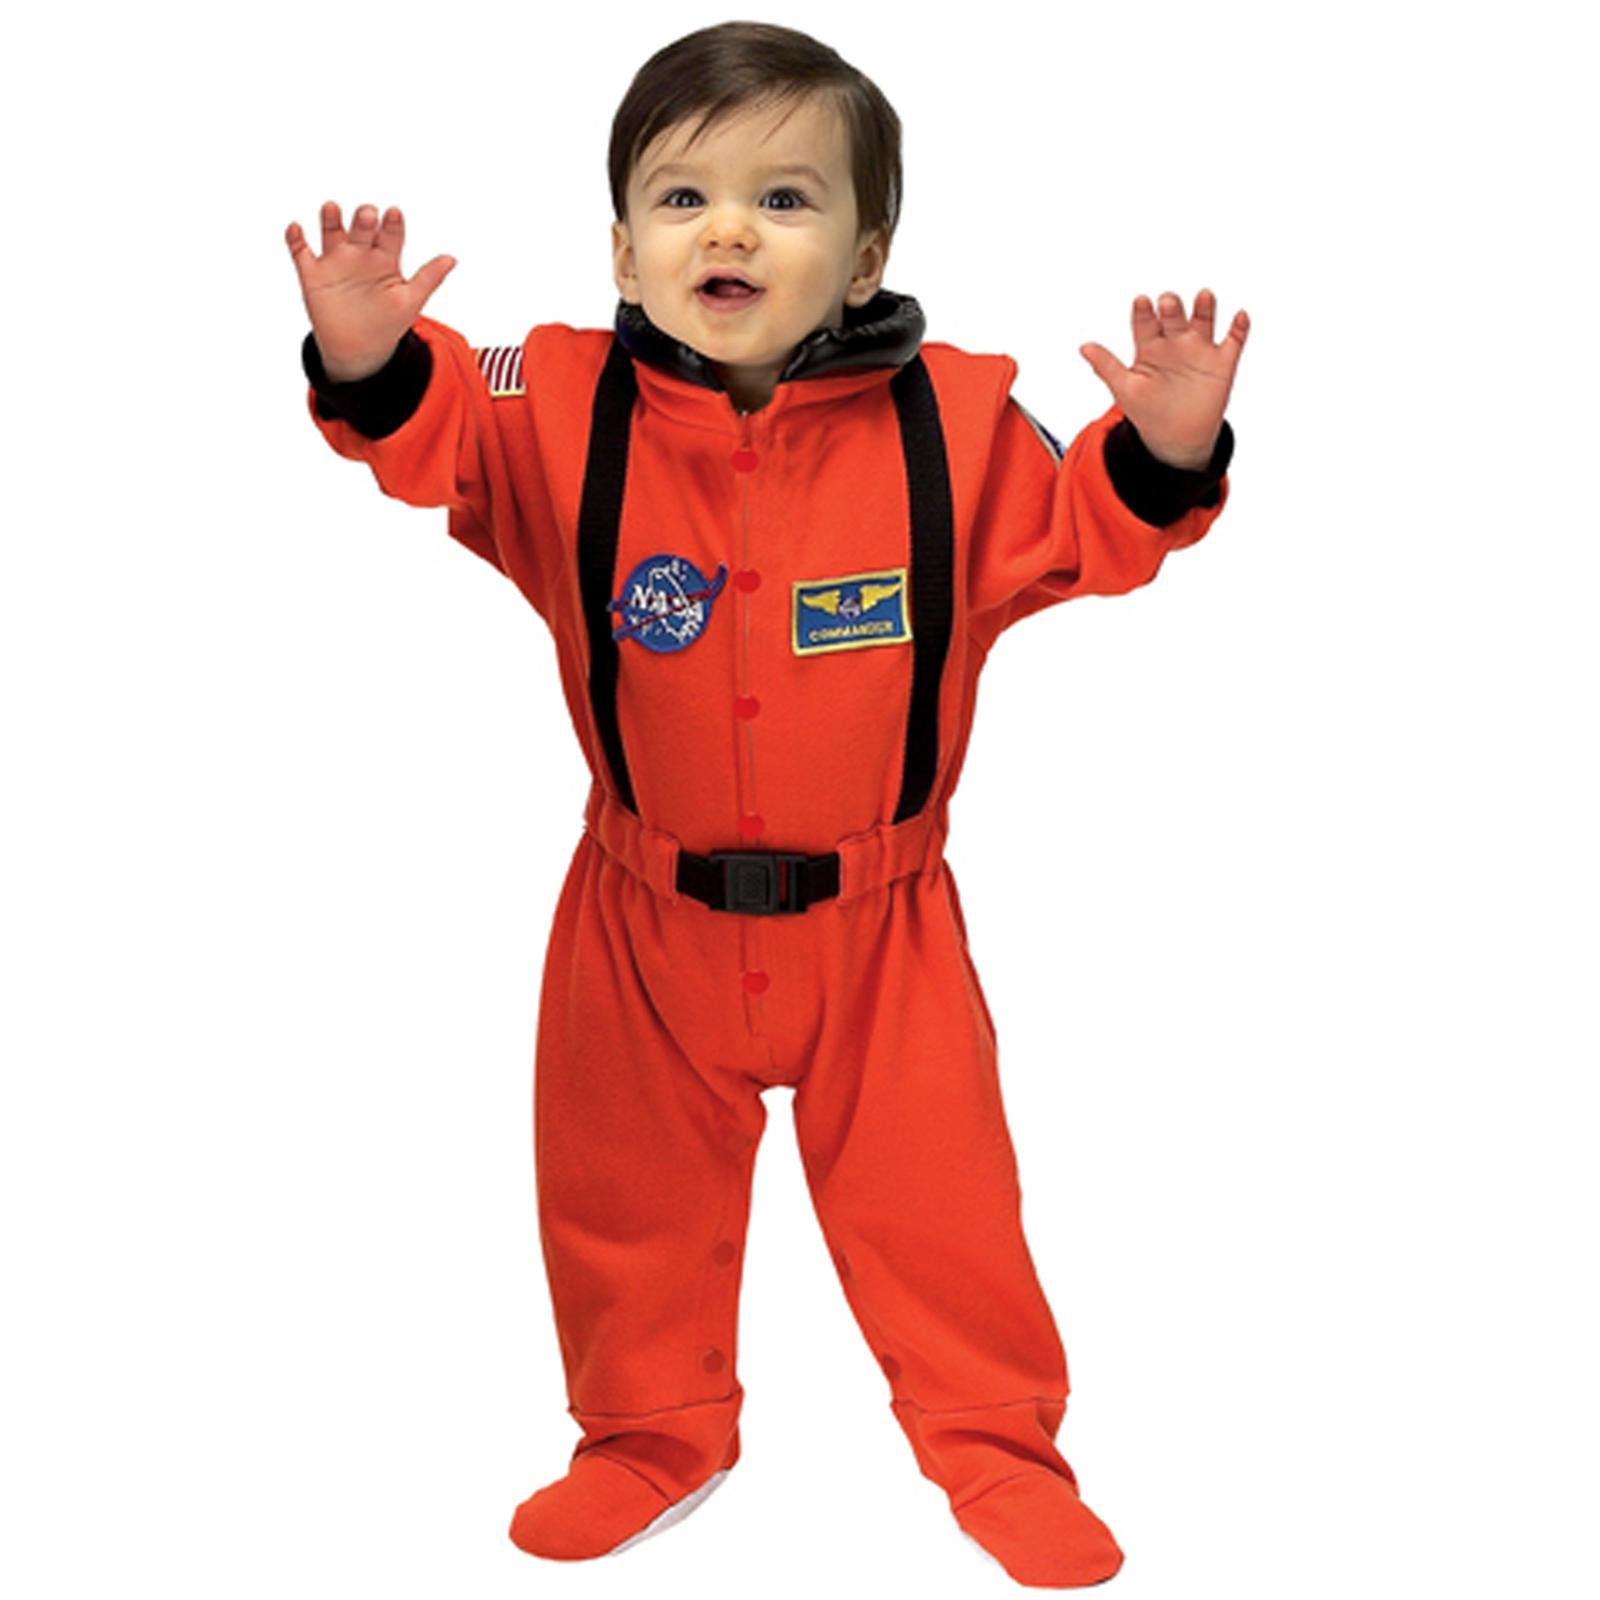 NASA Jr. Astronaut Suit (Orange) Infant Costume | BuyCostumes.com